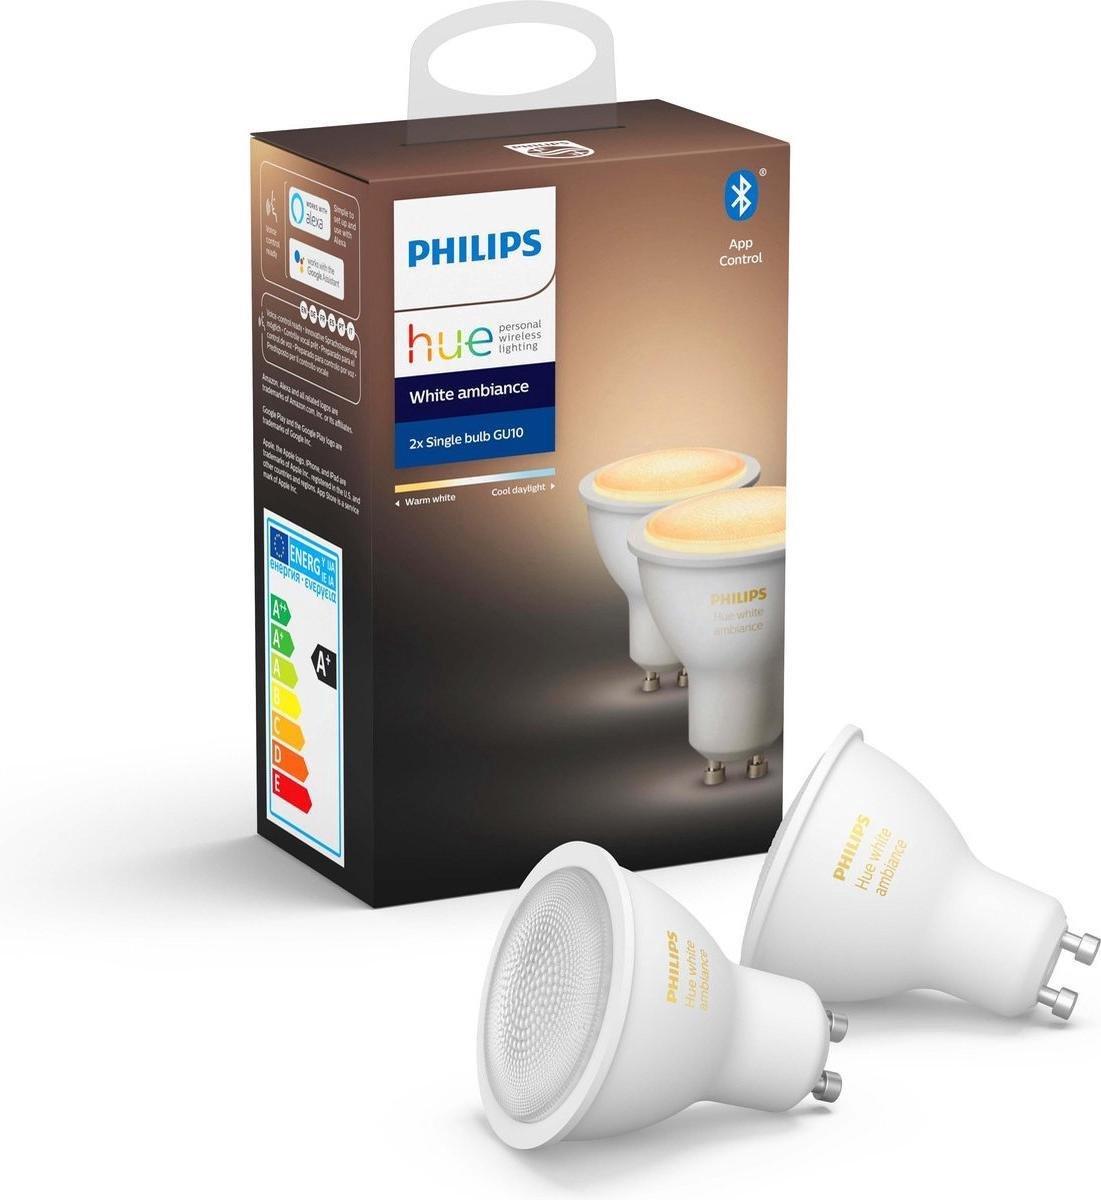 PHILIPS HUE - LED Spot Set GU10 - White Ambiance - Bluetooth - Pragmi Zano Pro - Inbouw Vierkant - Mat Zwart/Wit - Kantelbaar - 93mm